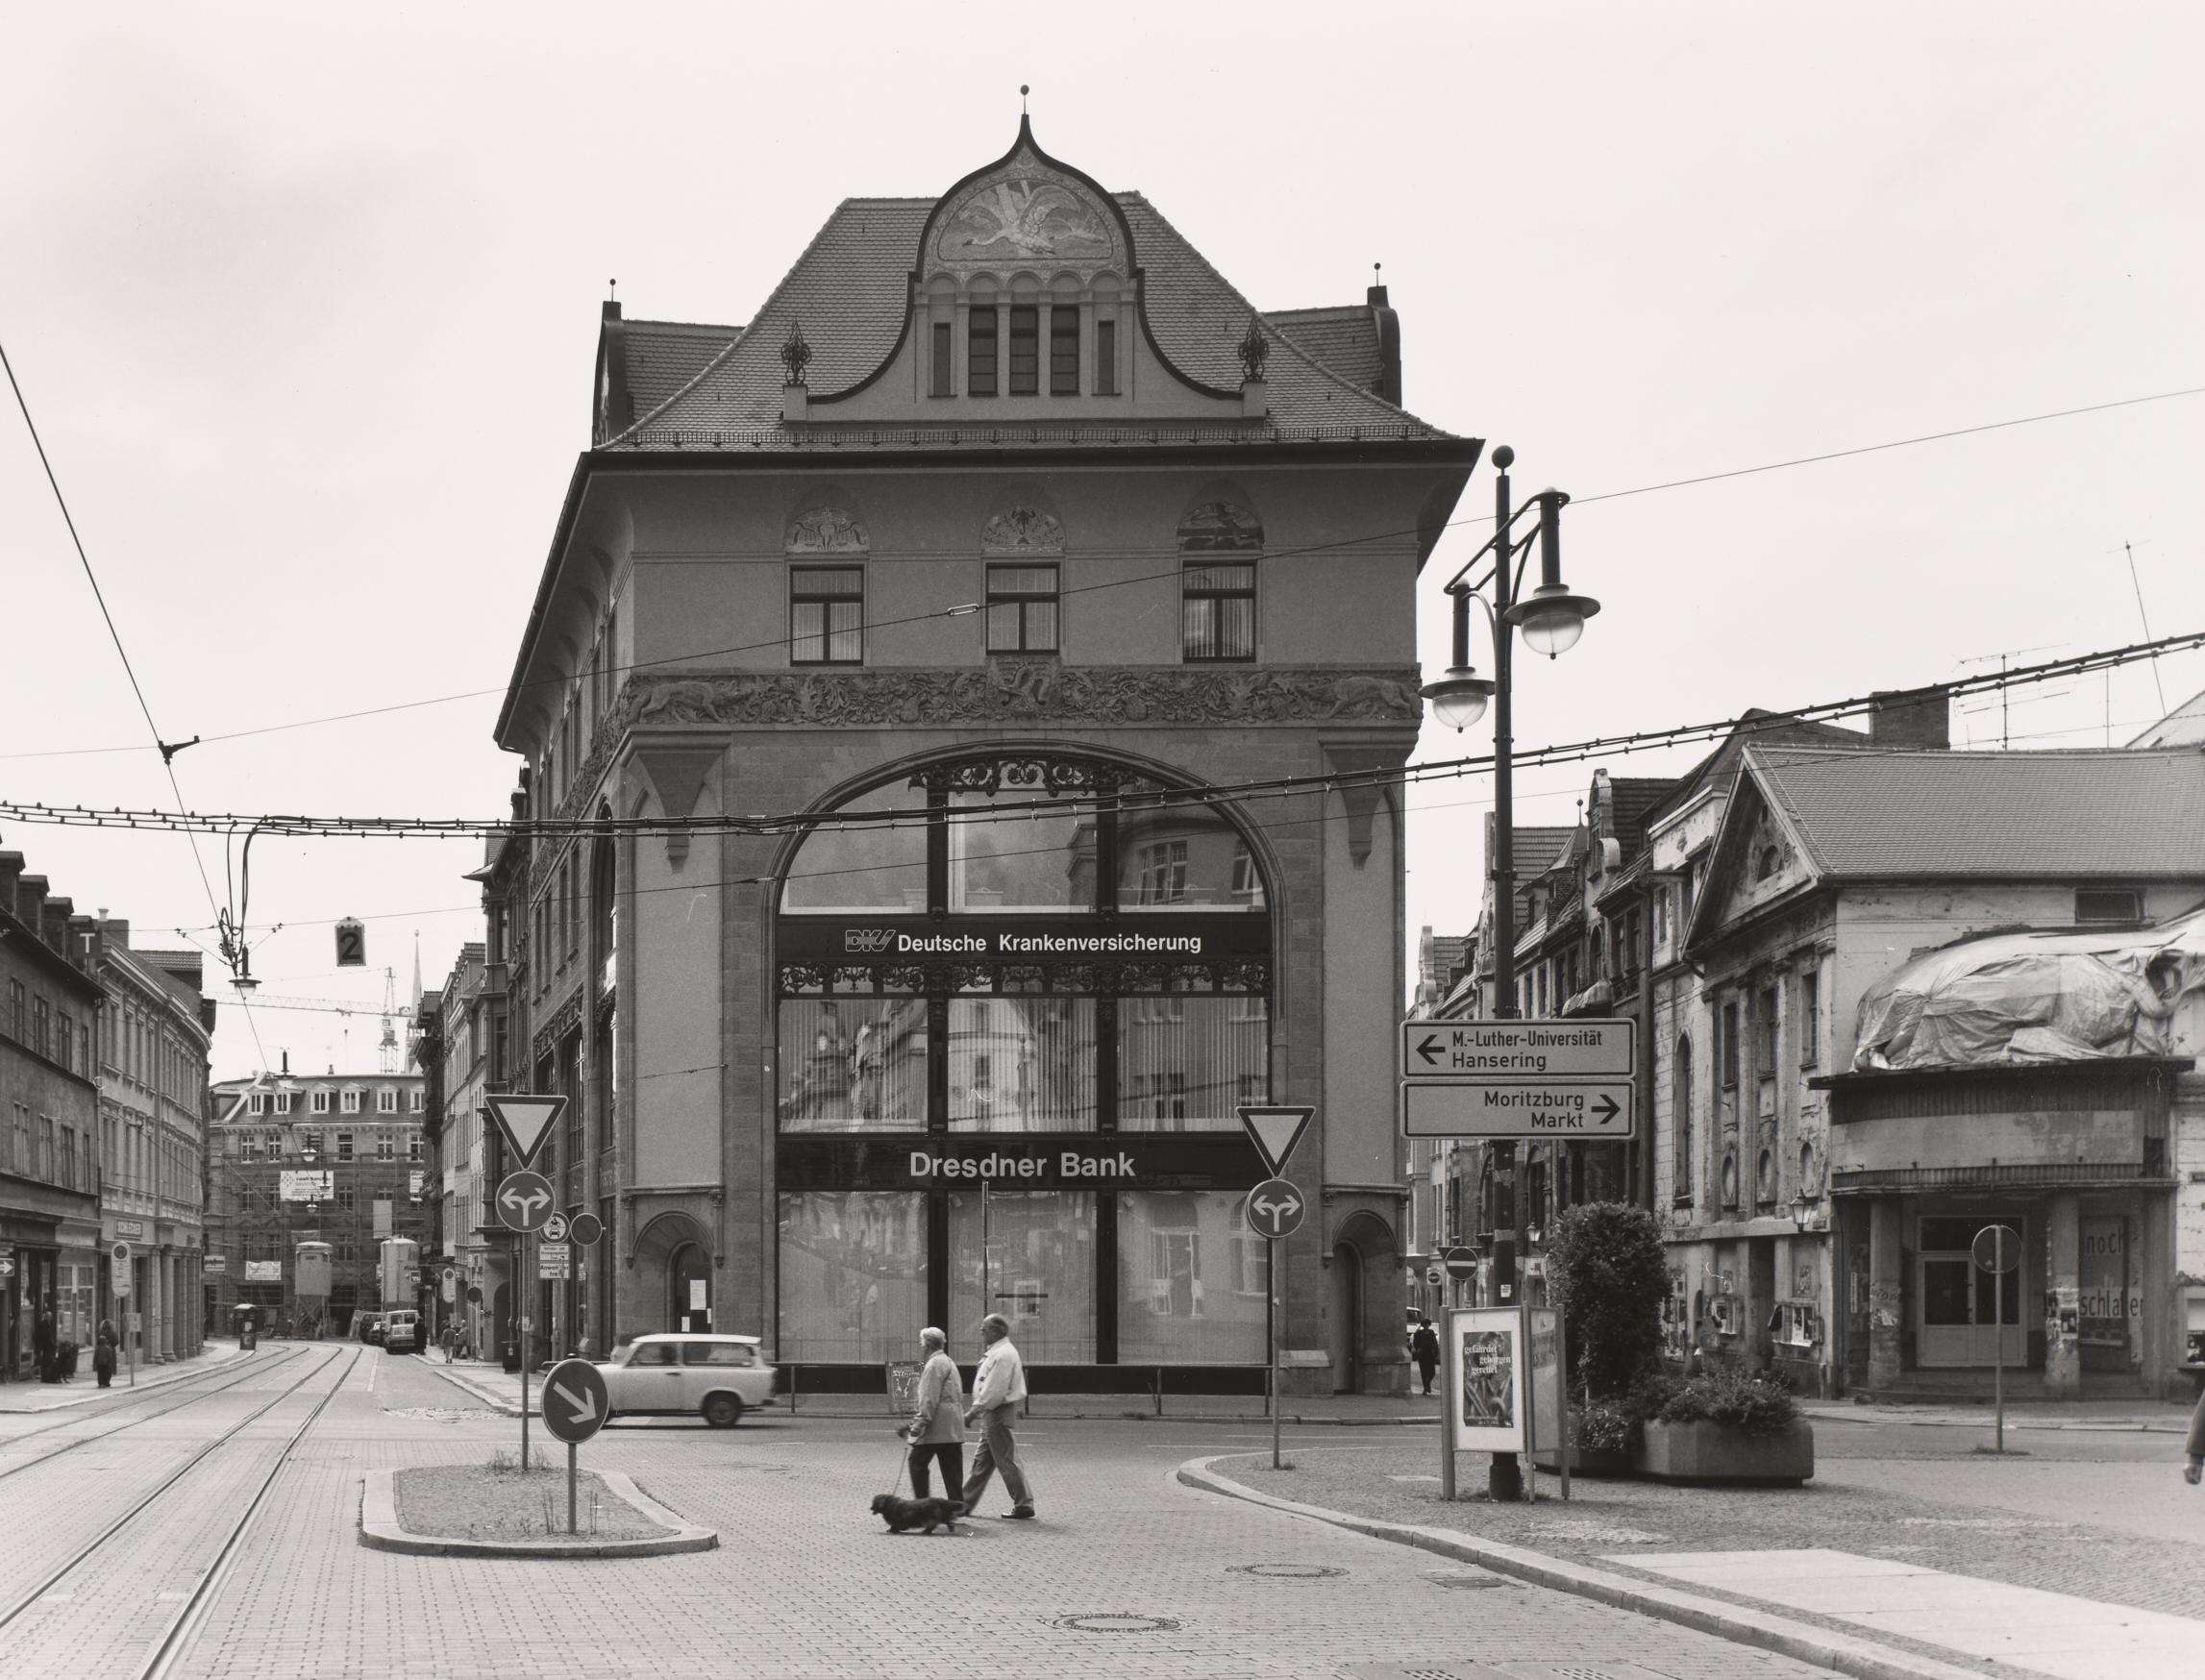 Schütze-Rodemann_Halle-Saale_Jugendstilhaus Döll_neben Urania 70_1998